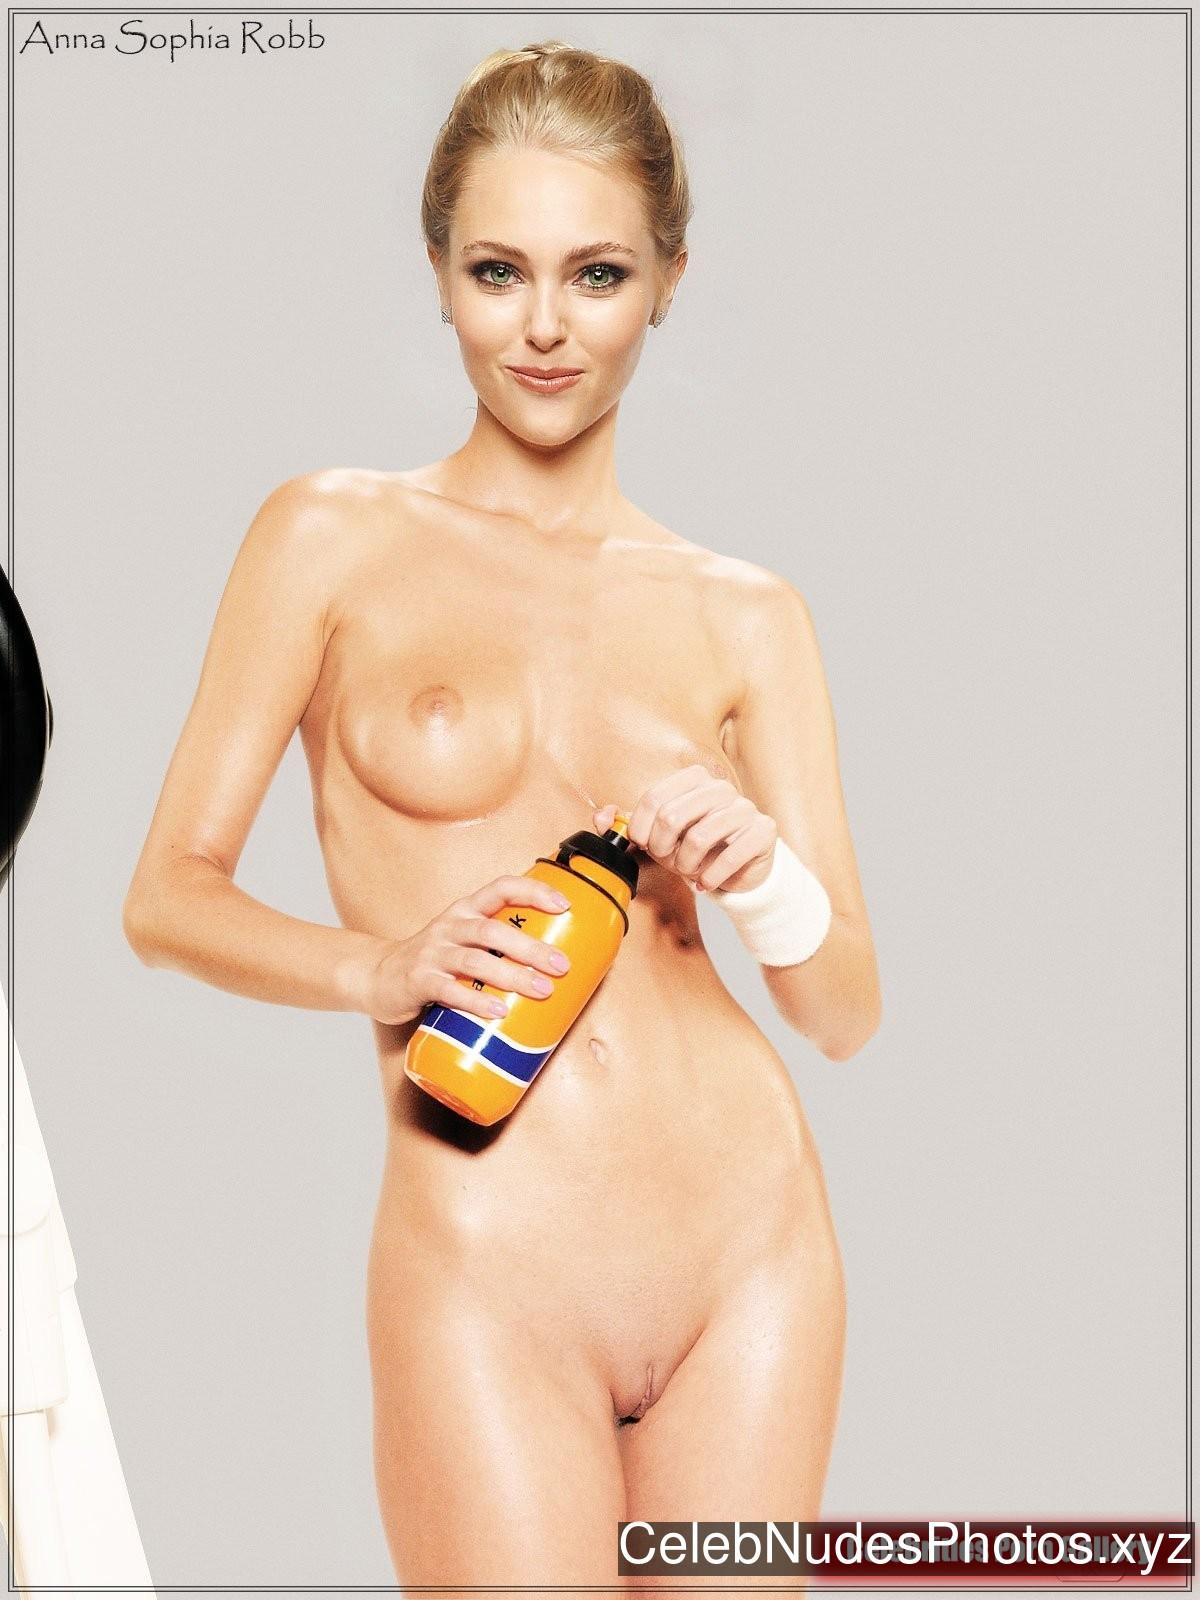 from Romeo fake nudes of annasophia robb